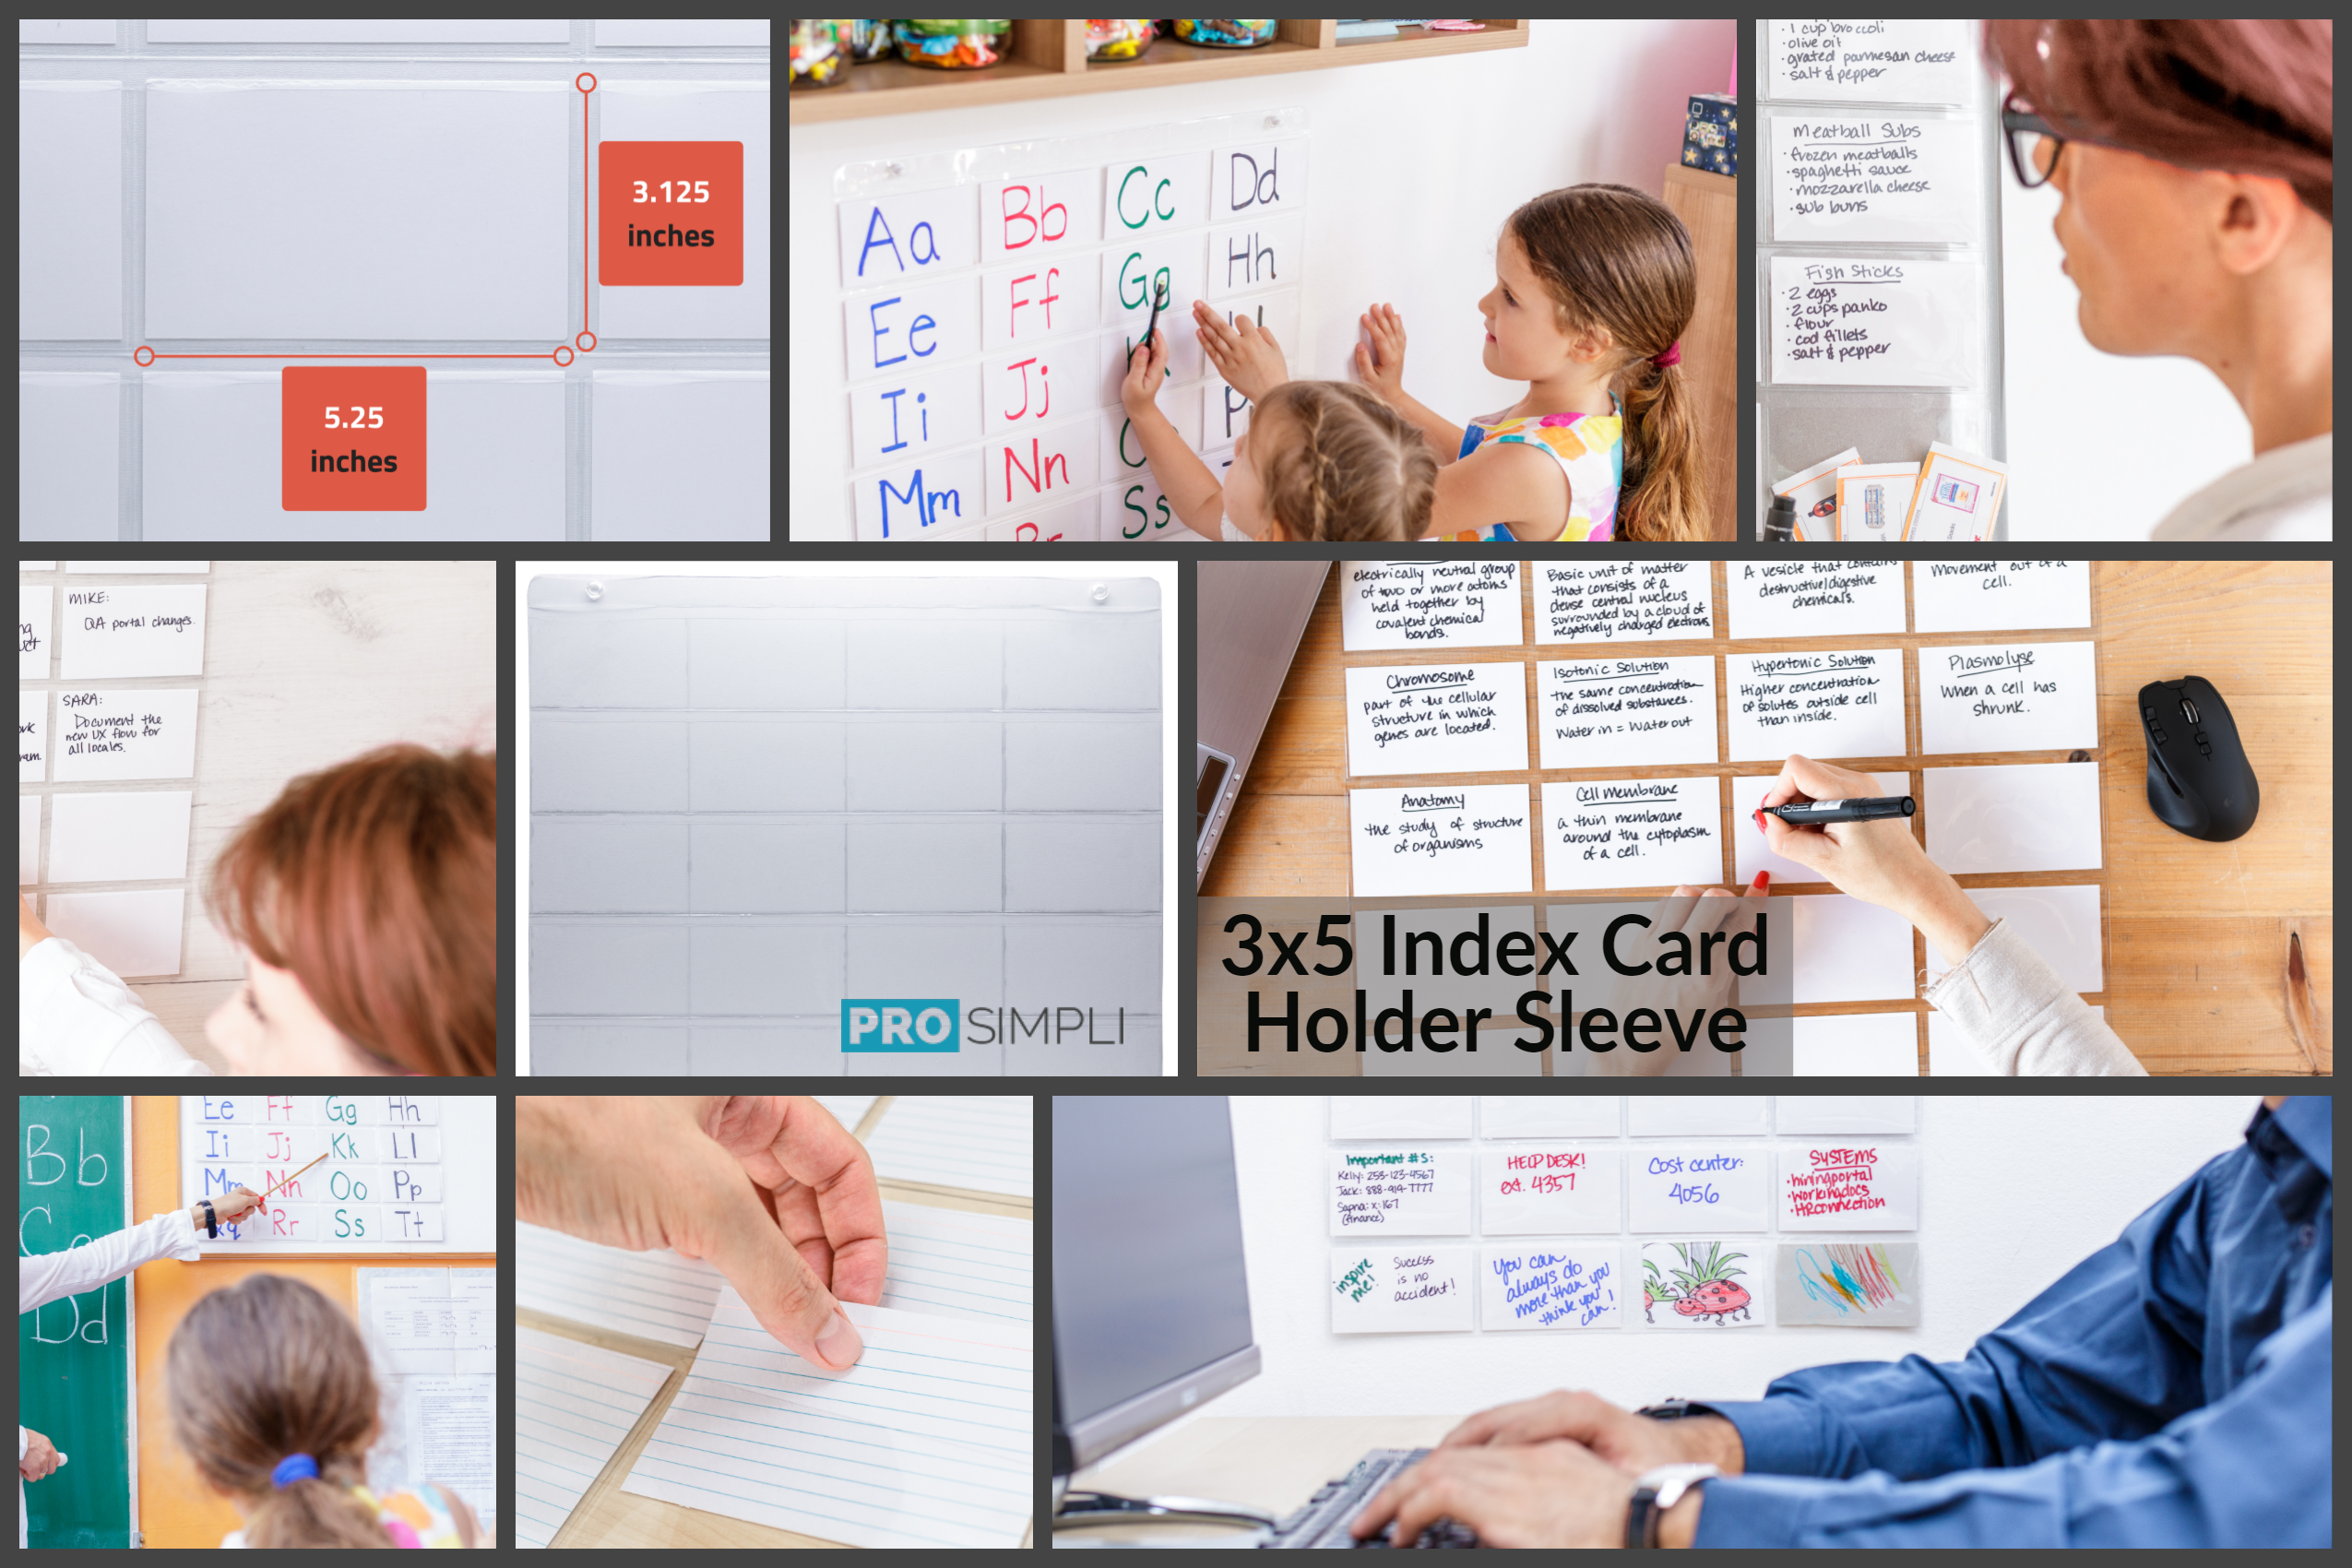 3x5 Index Card Holder Sleeve Uses